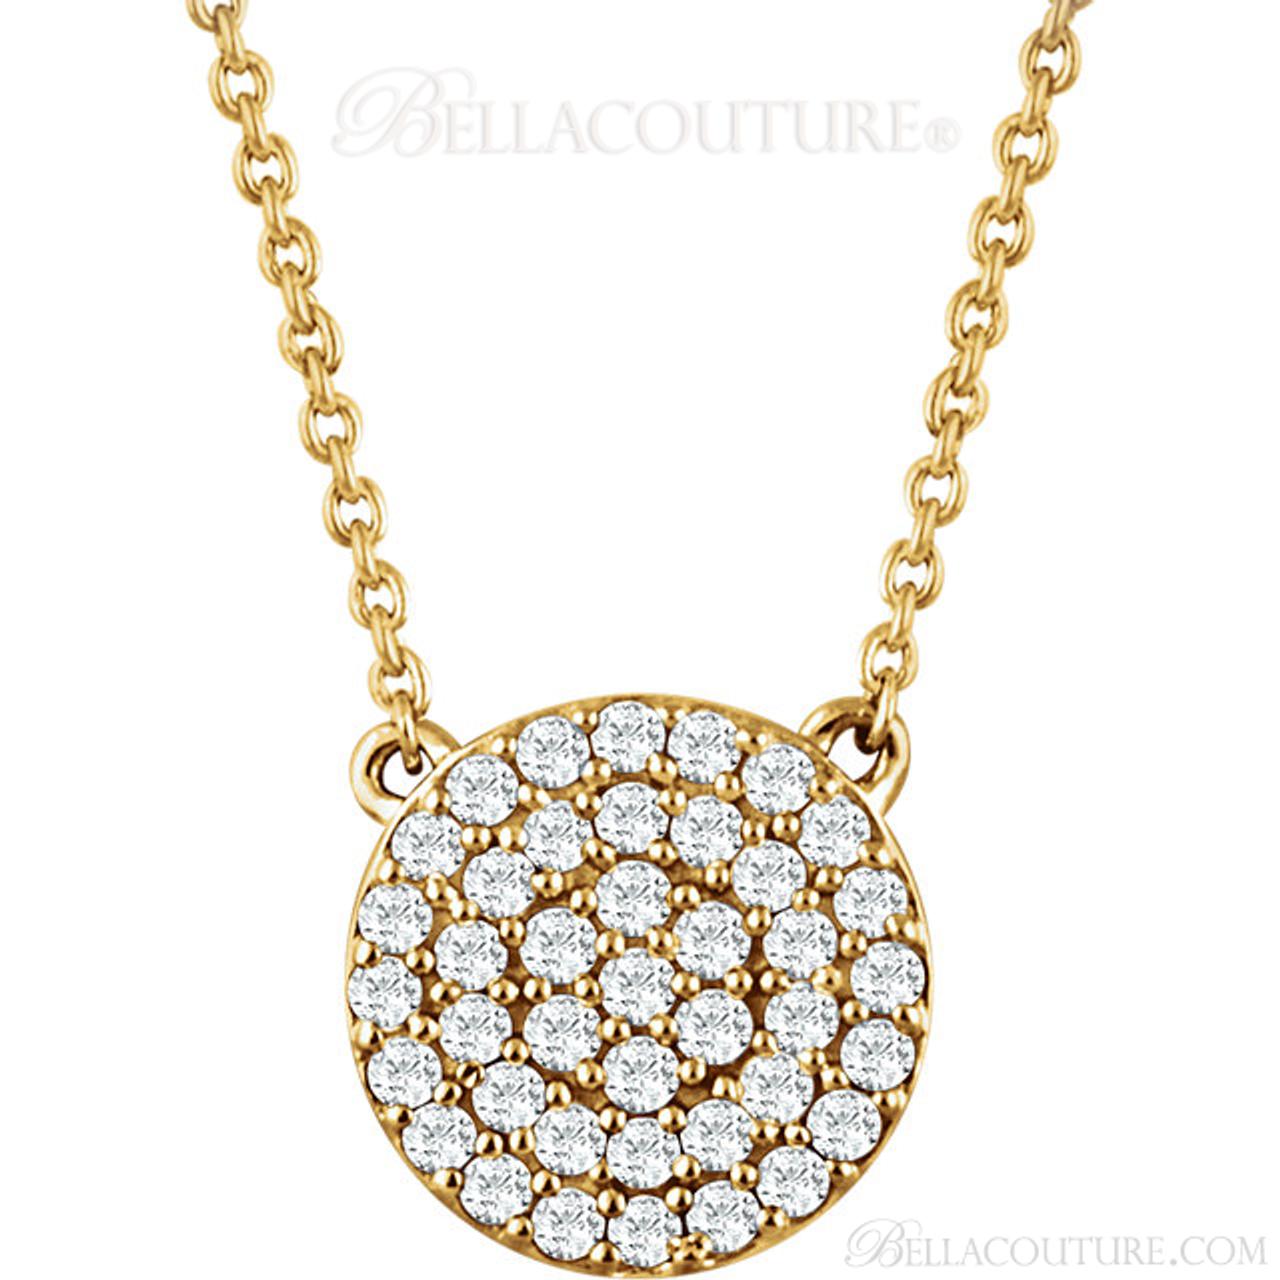 New bella couture cara gorgeous brilliant diamond 14k yellow gold new bella couture cara gorgeous brilliant diamond 14k yellow gold round pendant necklace aloadofball Choice Image